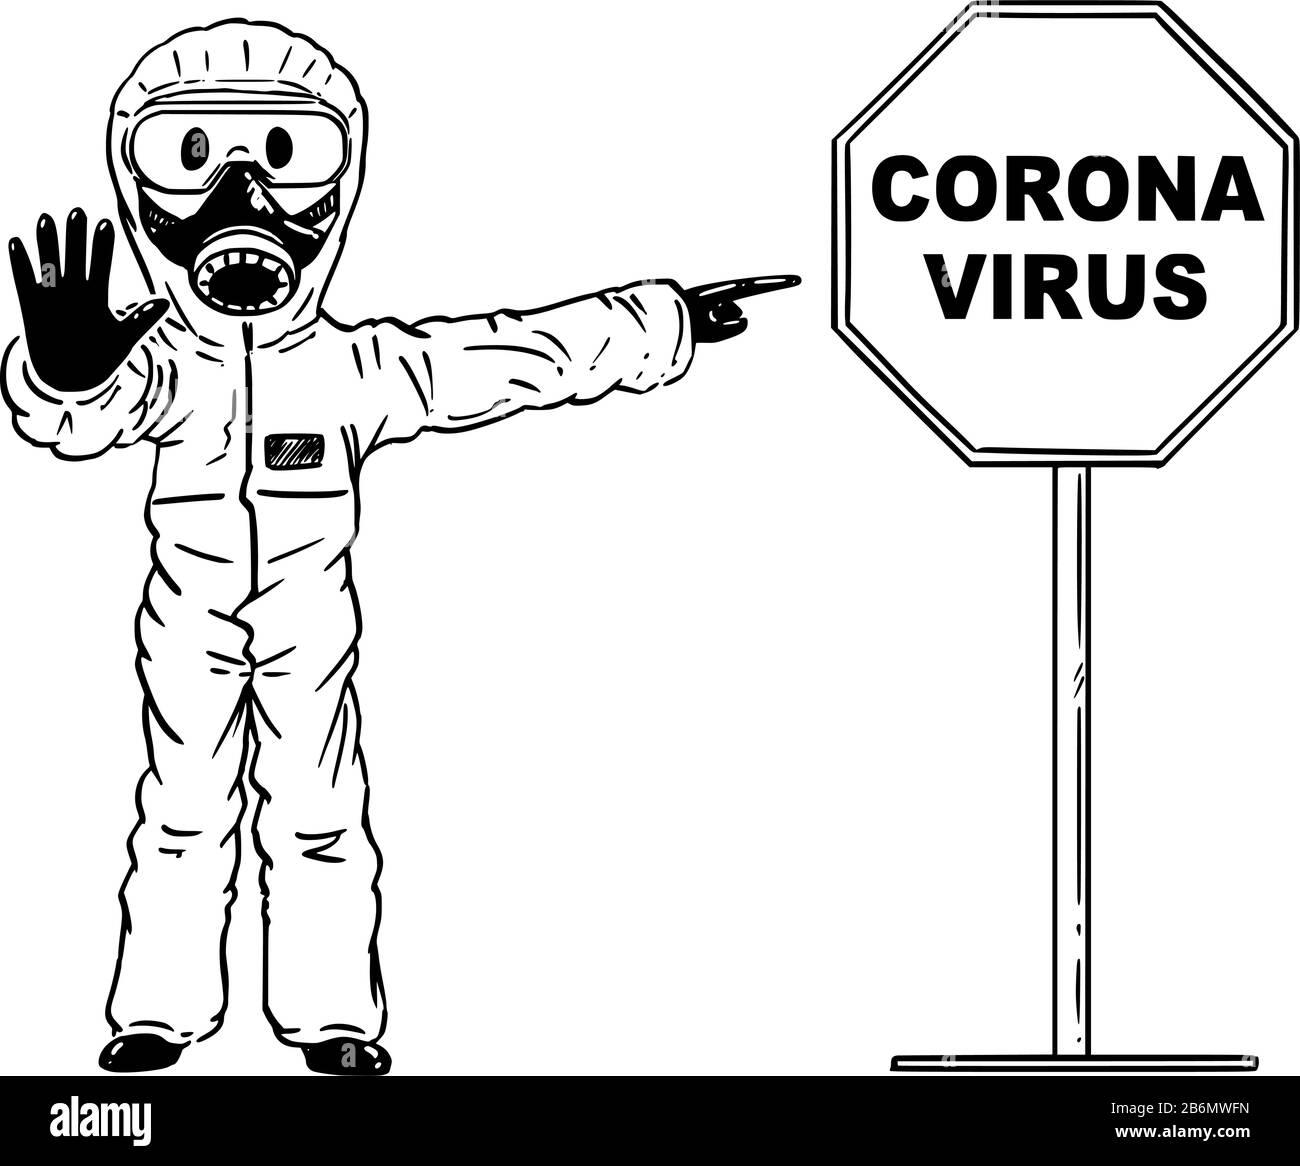 Corona Virus Mask Man Drawing